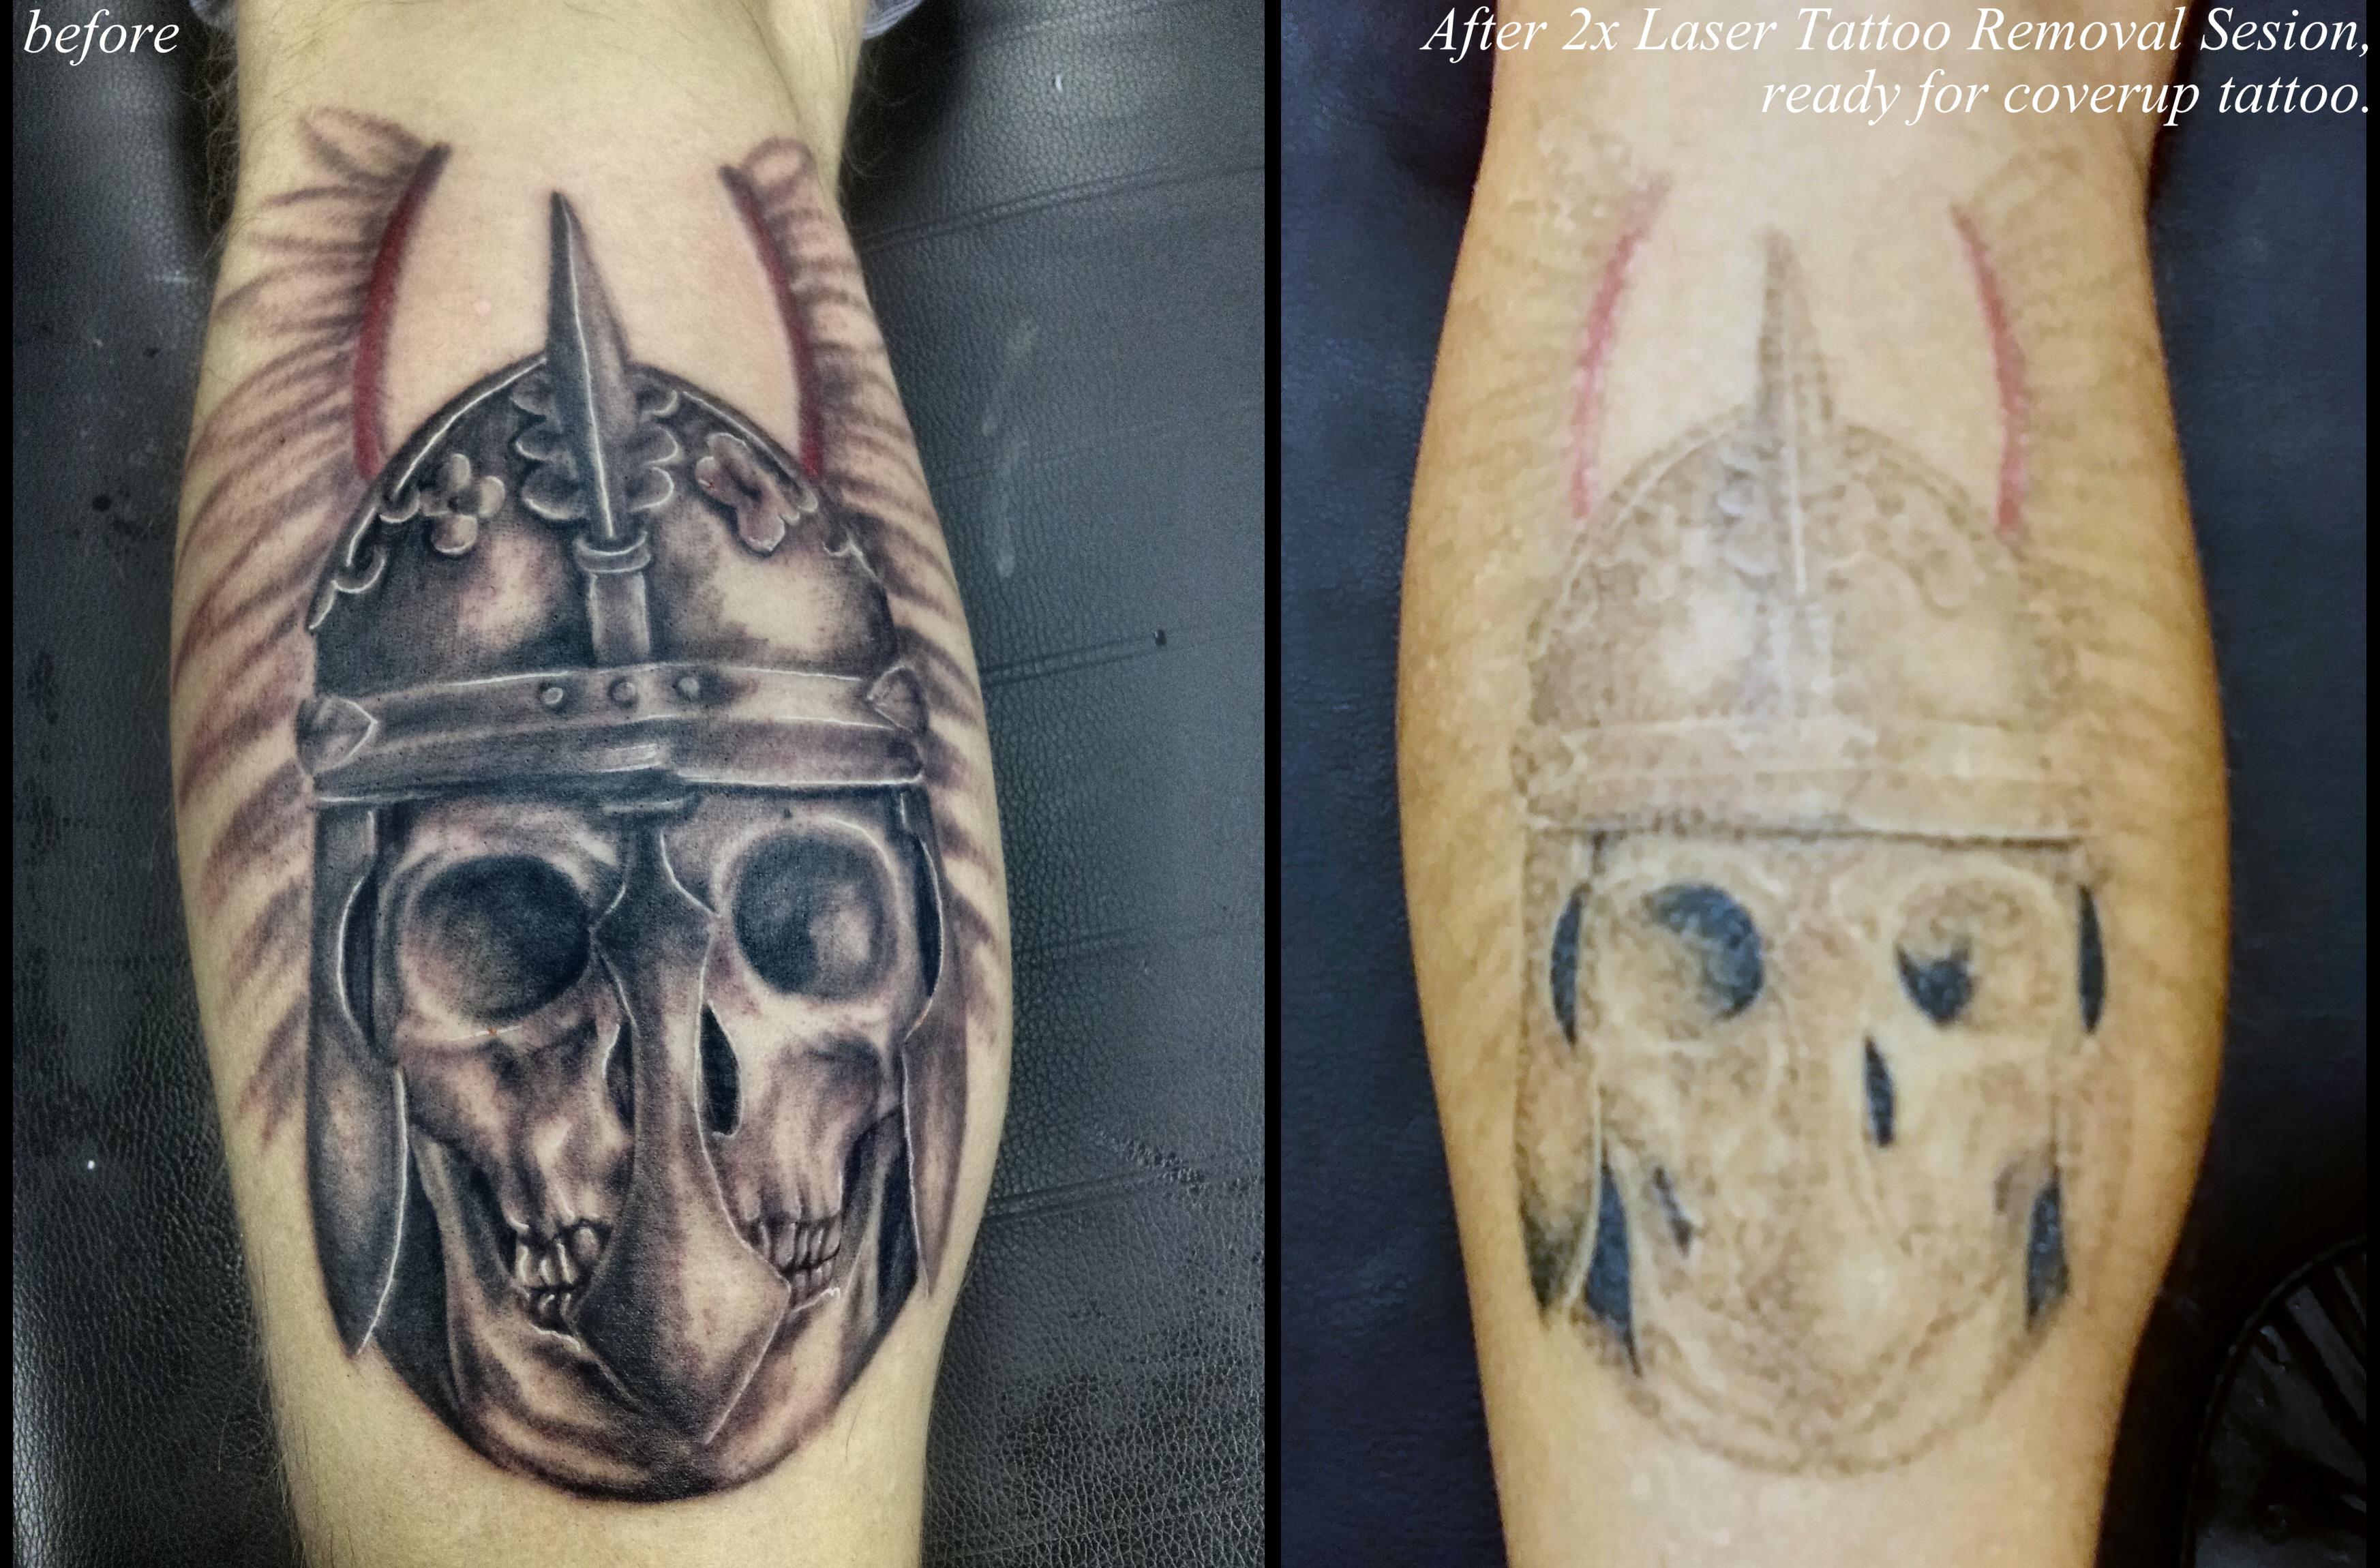 Tattoo and PMU removal with laser. | Dark Rose Tattoo